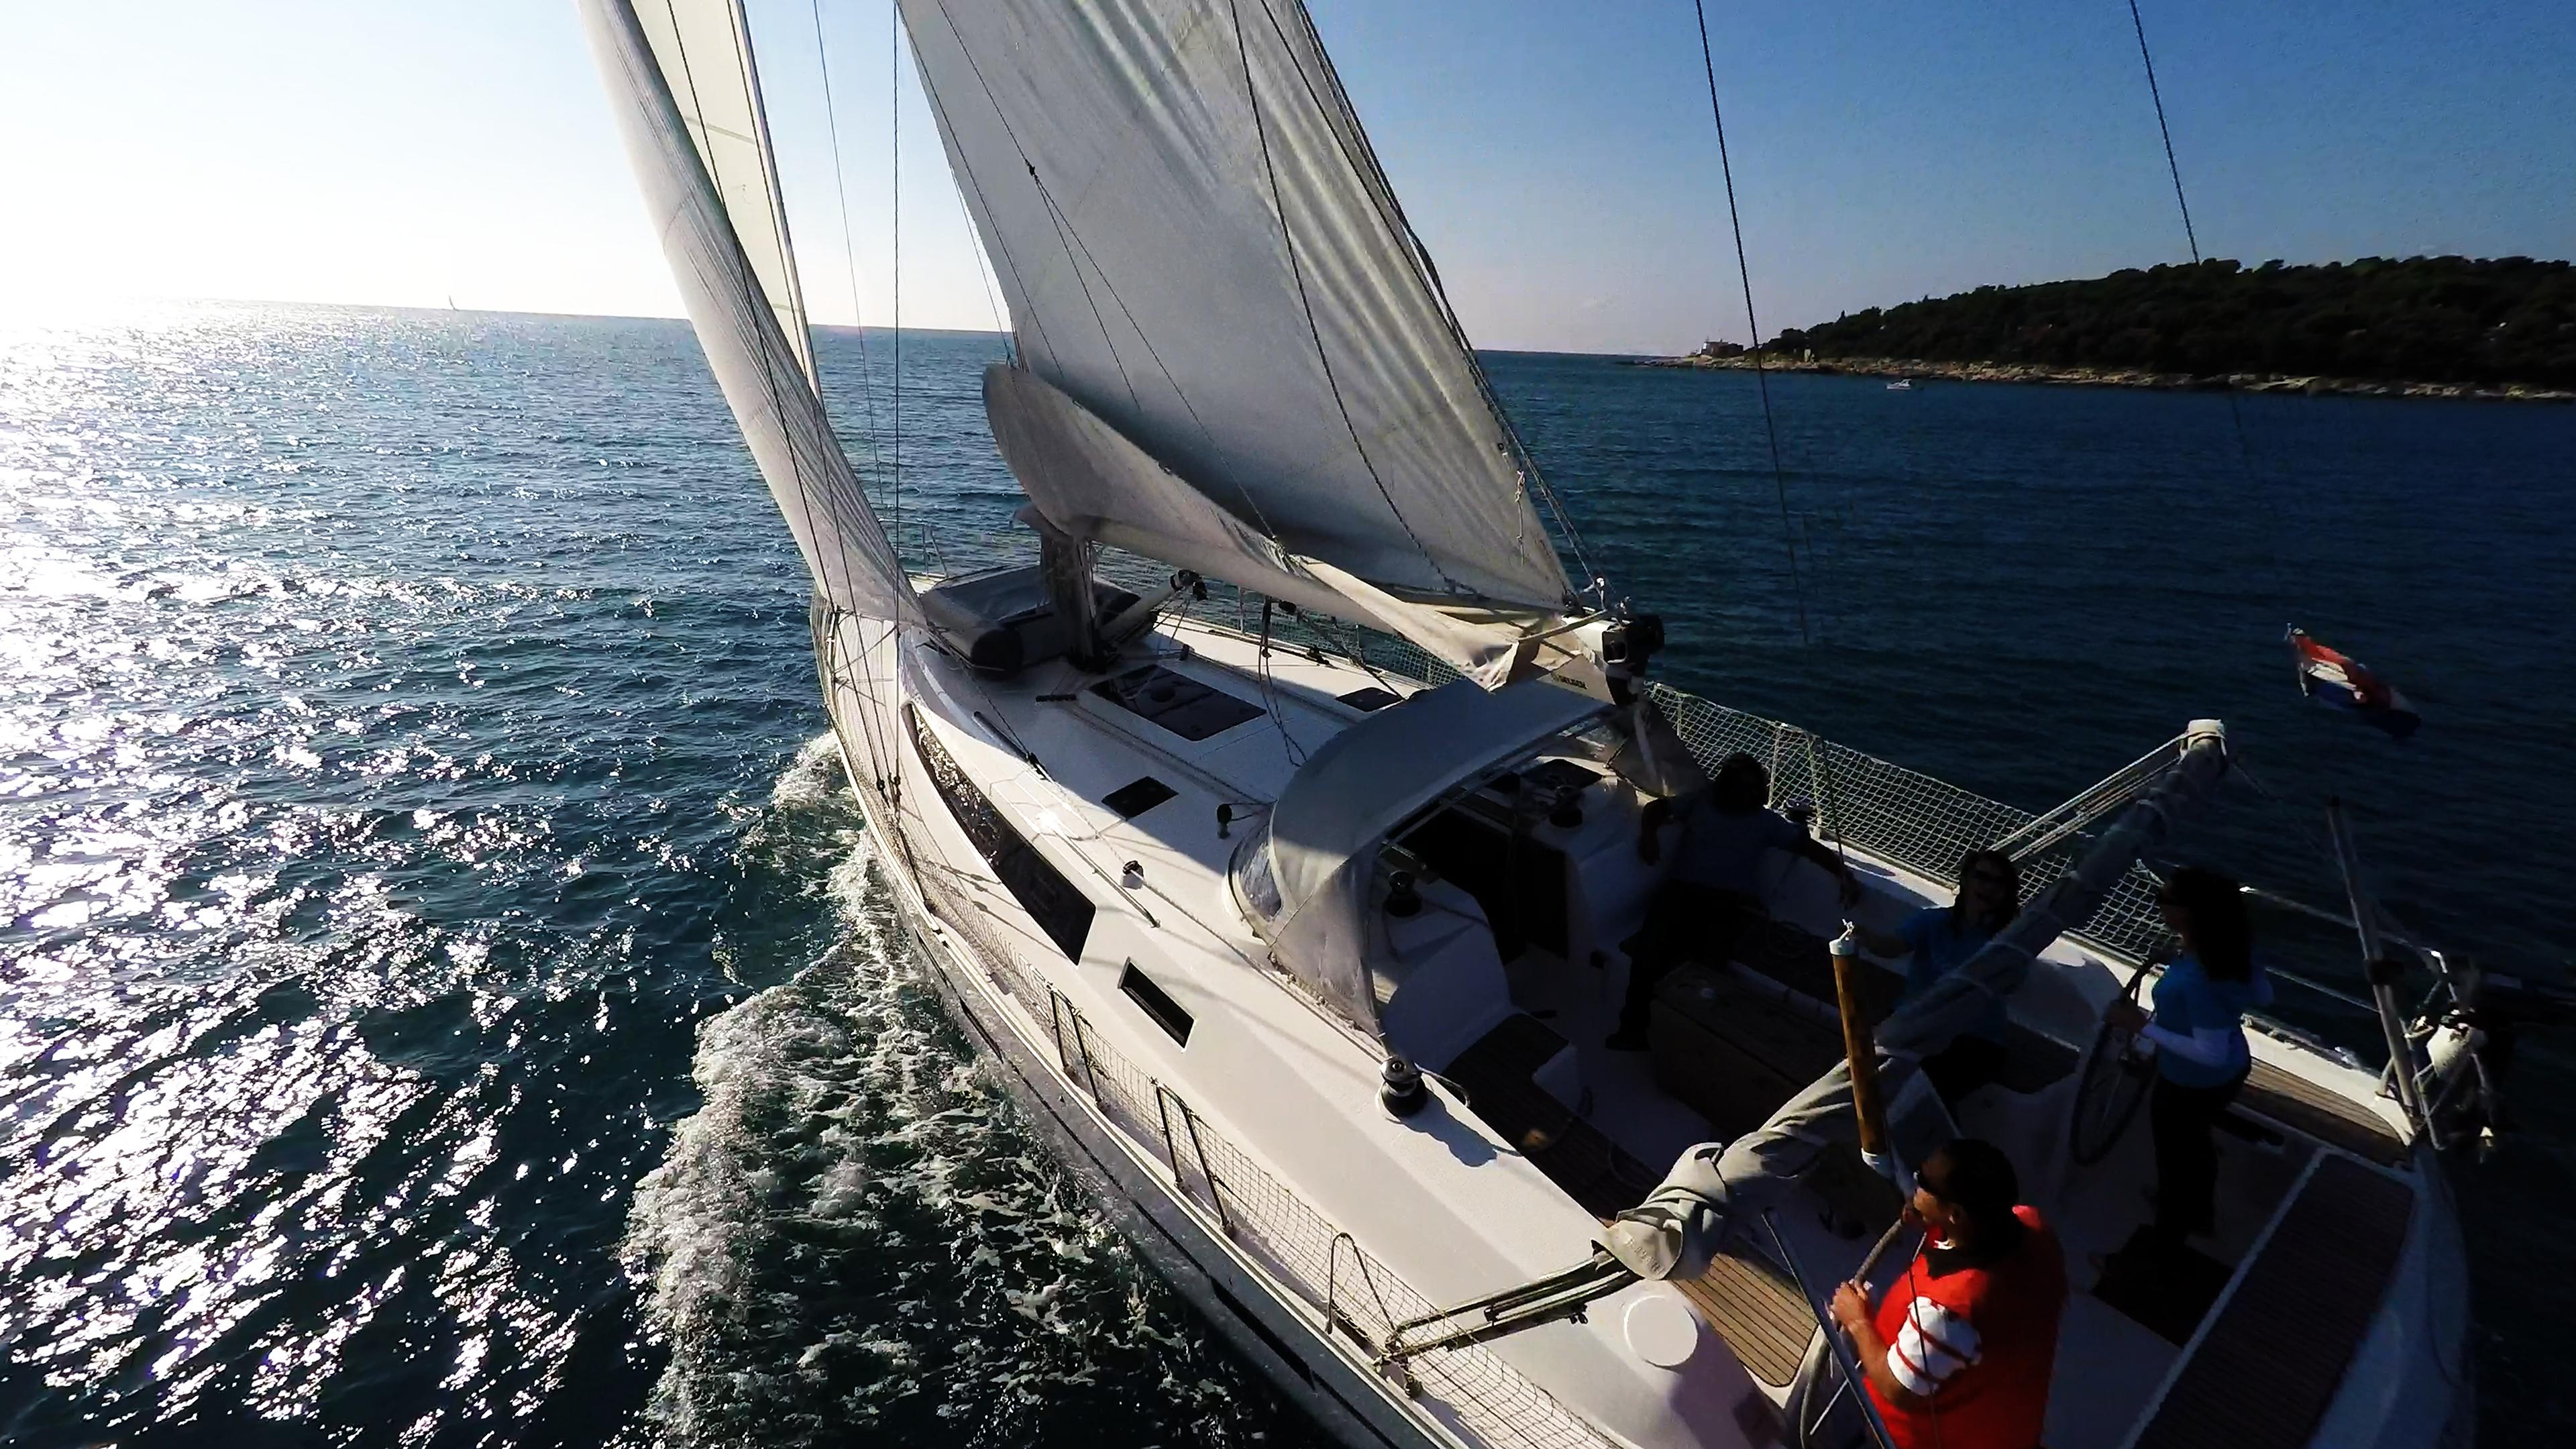 barcha a vela barca a vela vela yacht a vela skipper equipaggio pozzetto